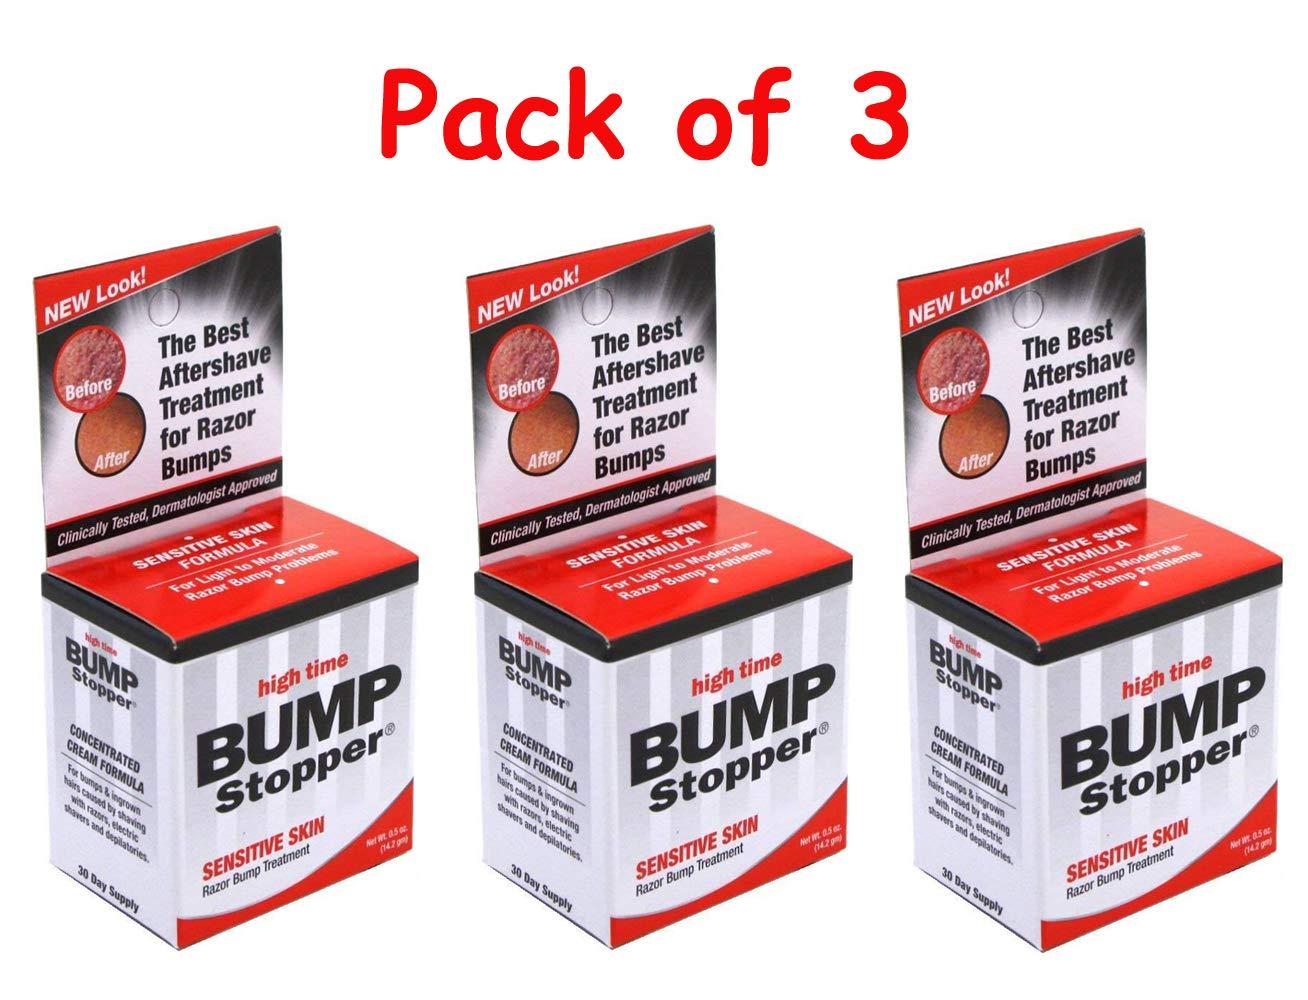 High Time Bump Stopper Sensitive Skin 0.5oz Treatment (3 Pack) 43429003030